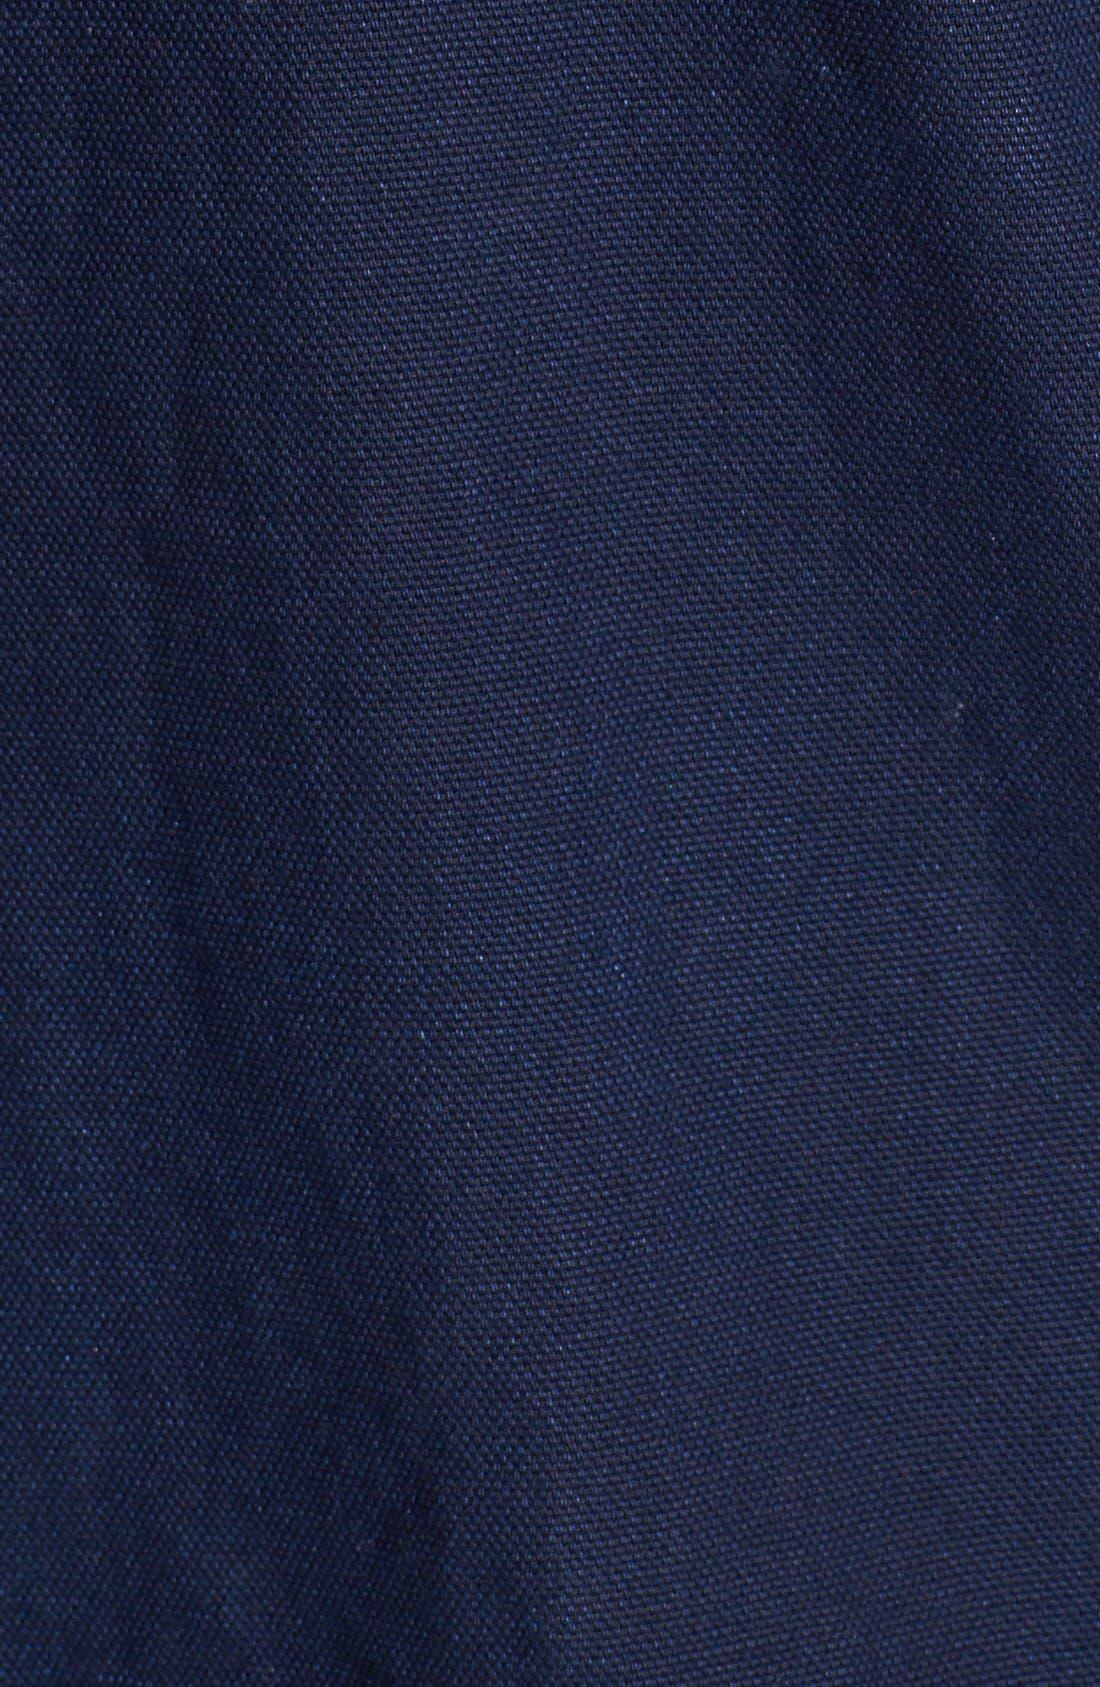 Alternate Image 3  - rag & bone Denim Jacket